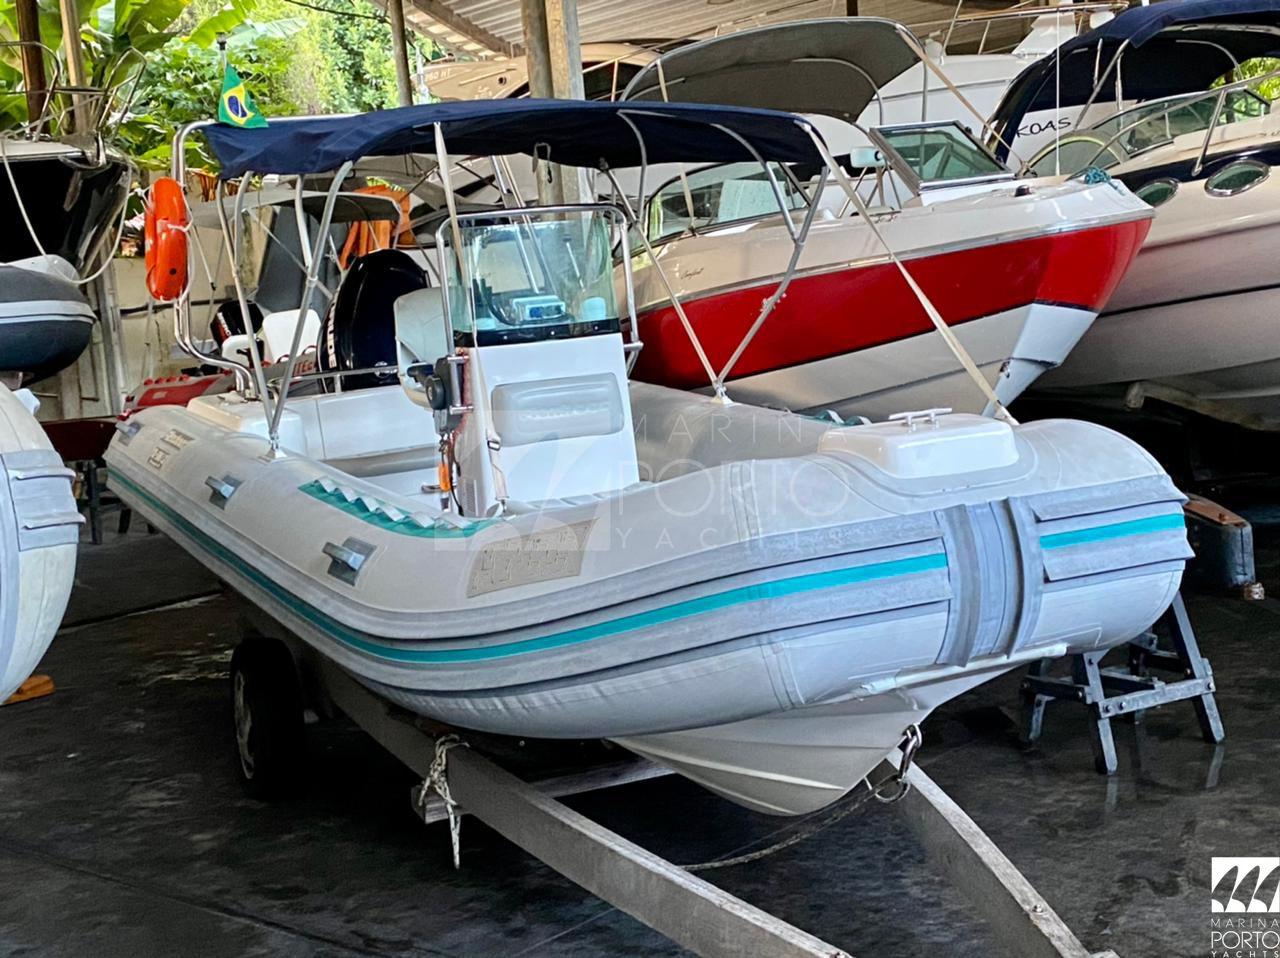 Flexboat SR 500